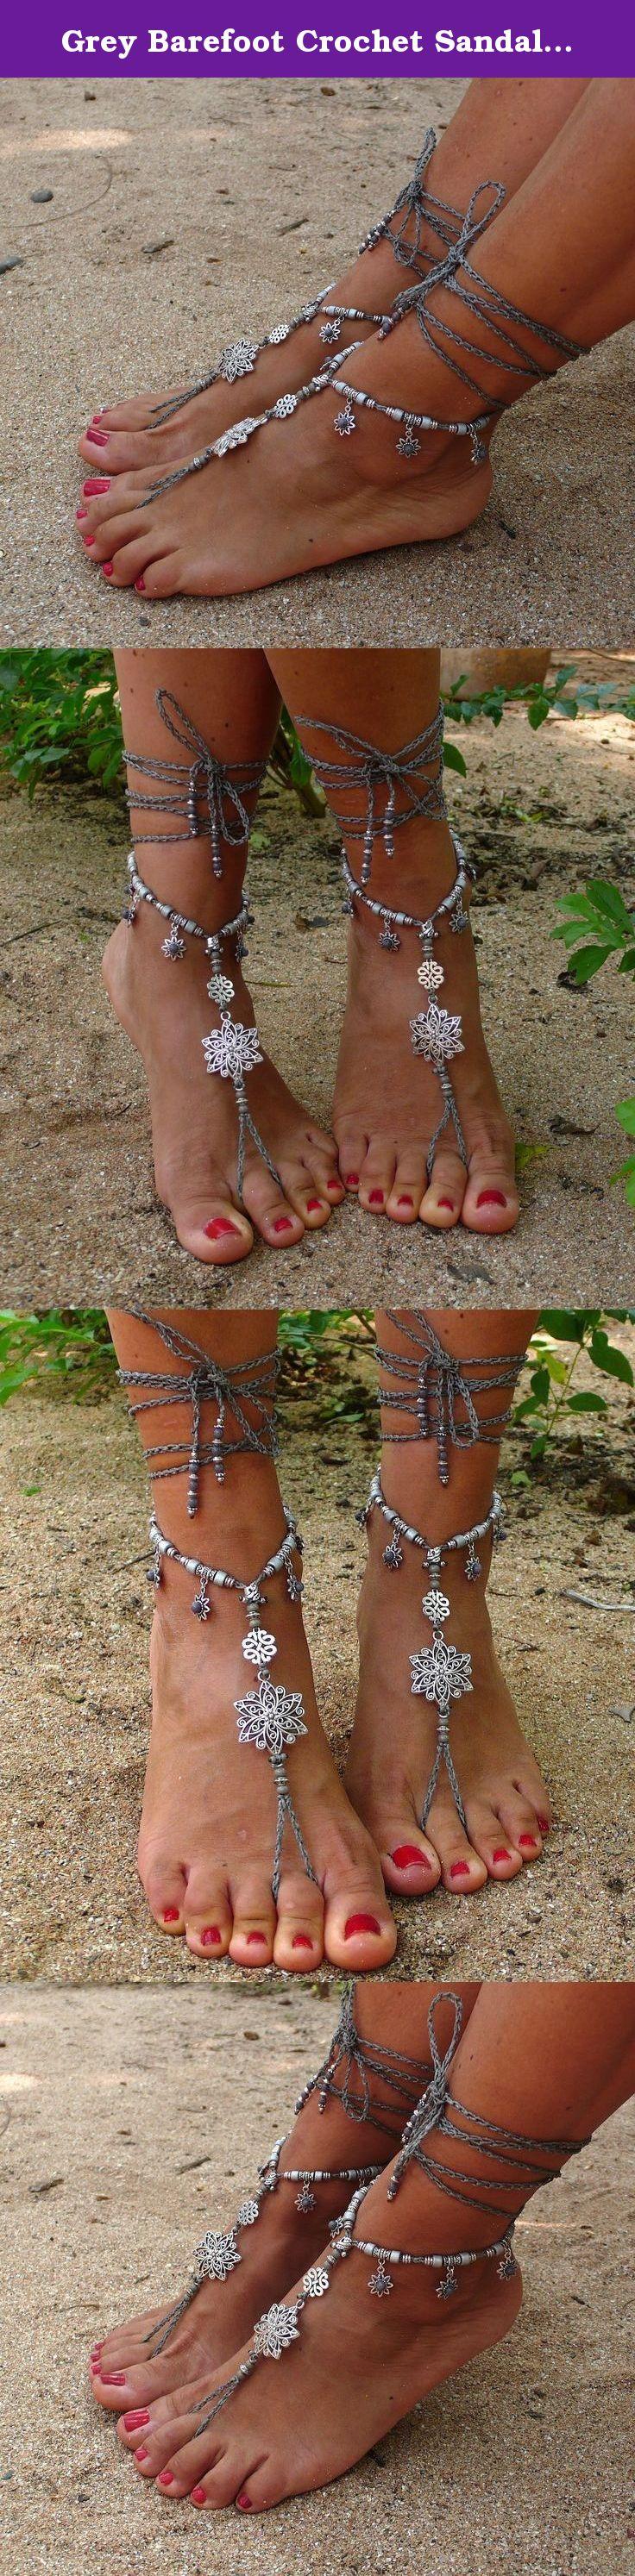 Grey Barefoot Crochet Sandals Silver Flower Hippie Outdoor